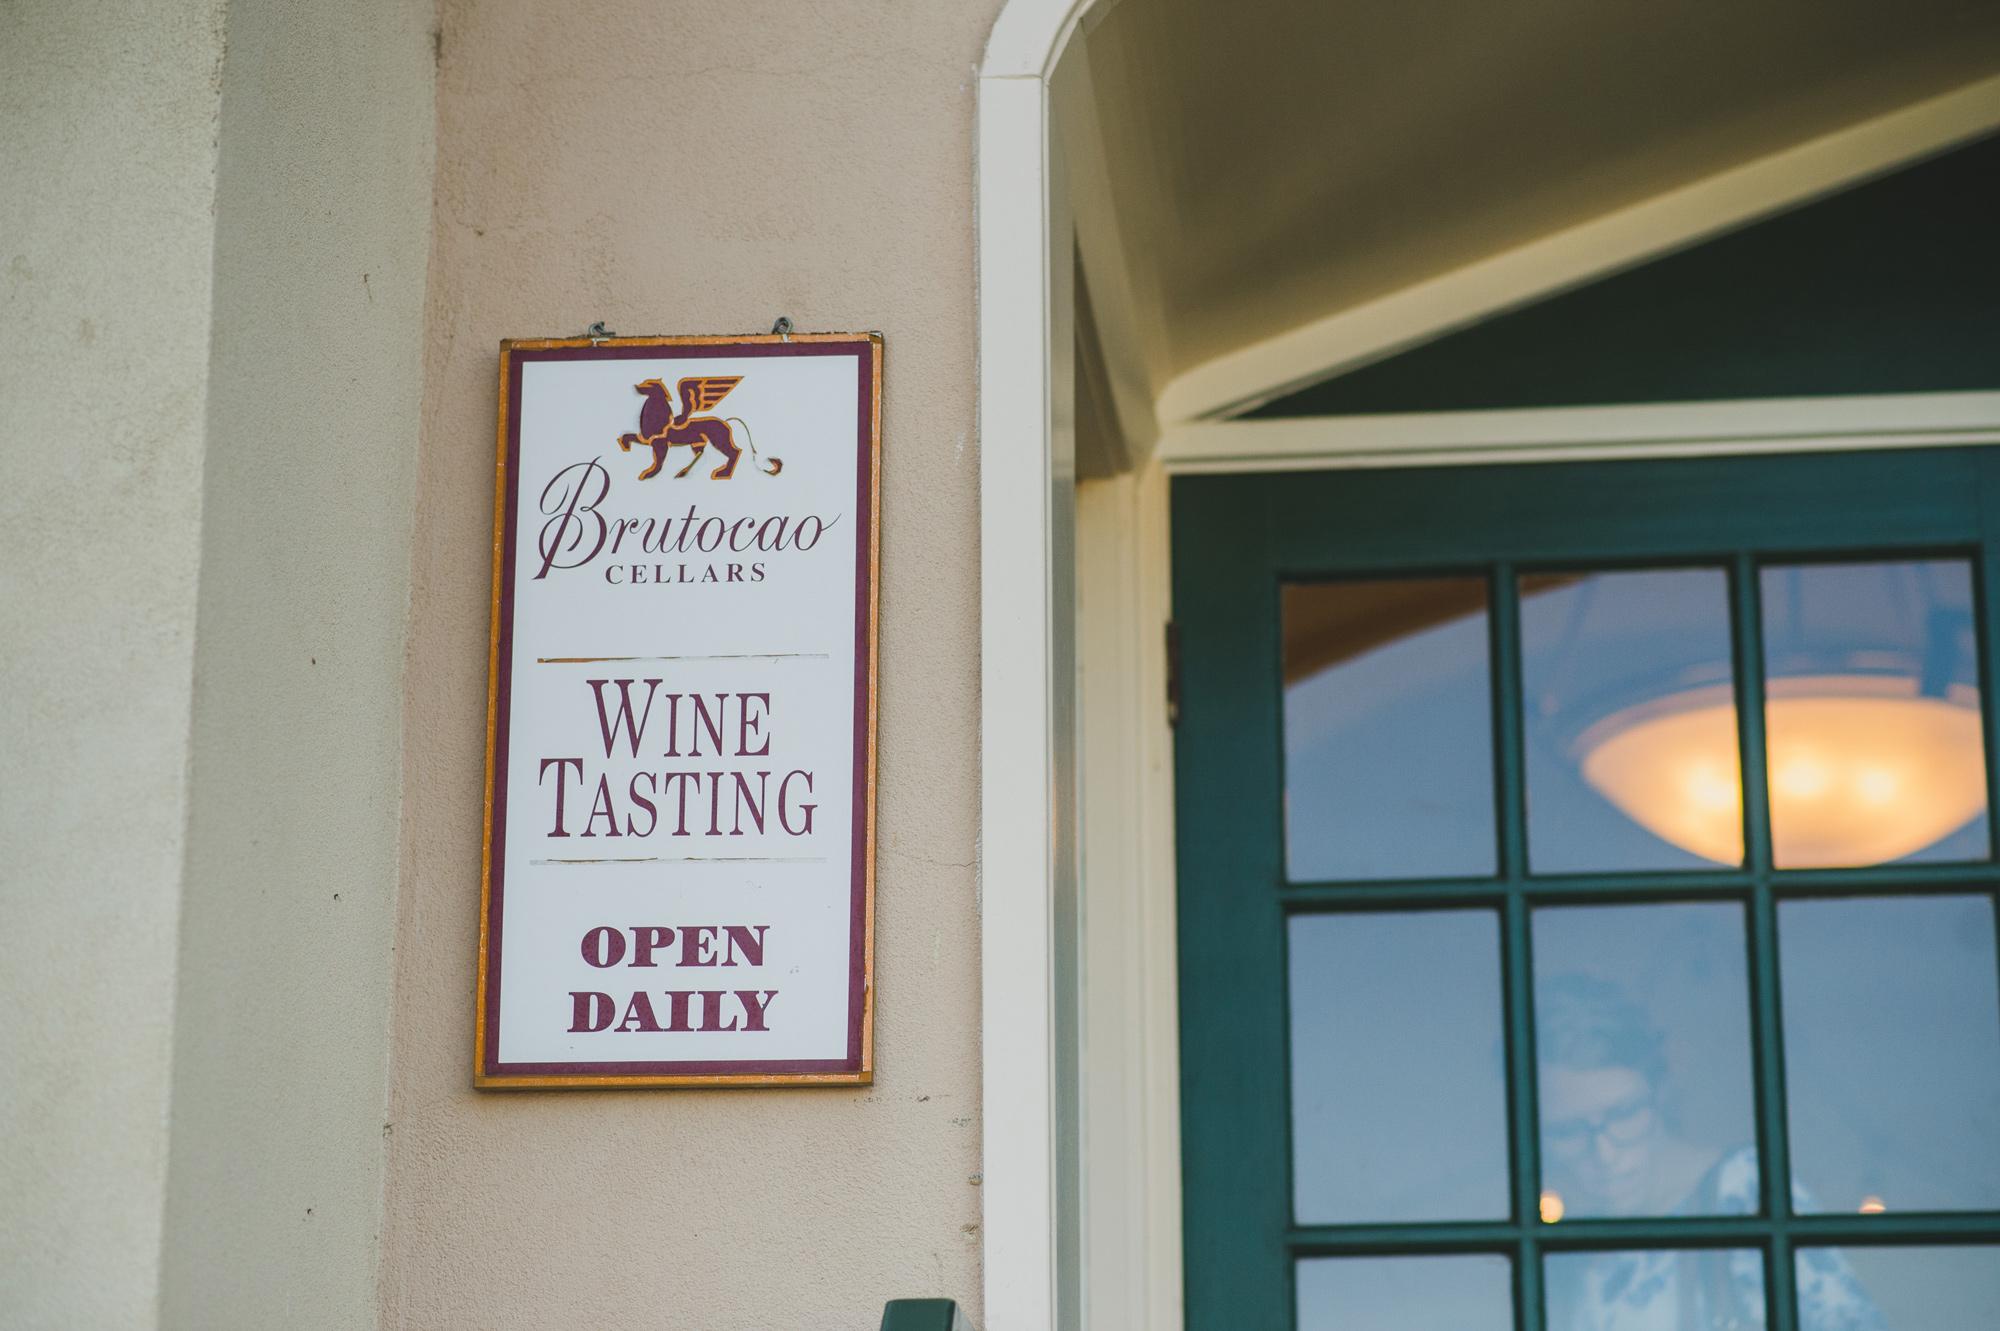 Brutocao Cellar's Hopland Tasting Room